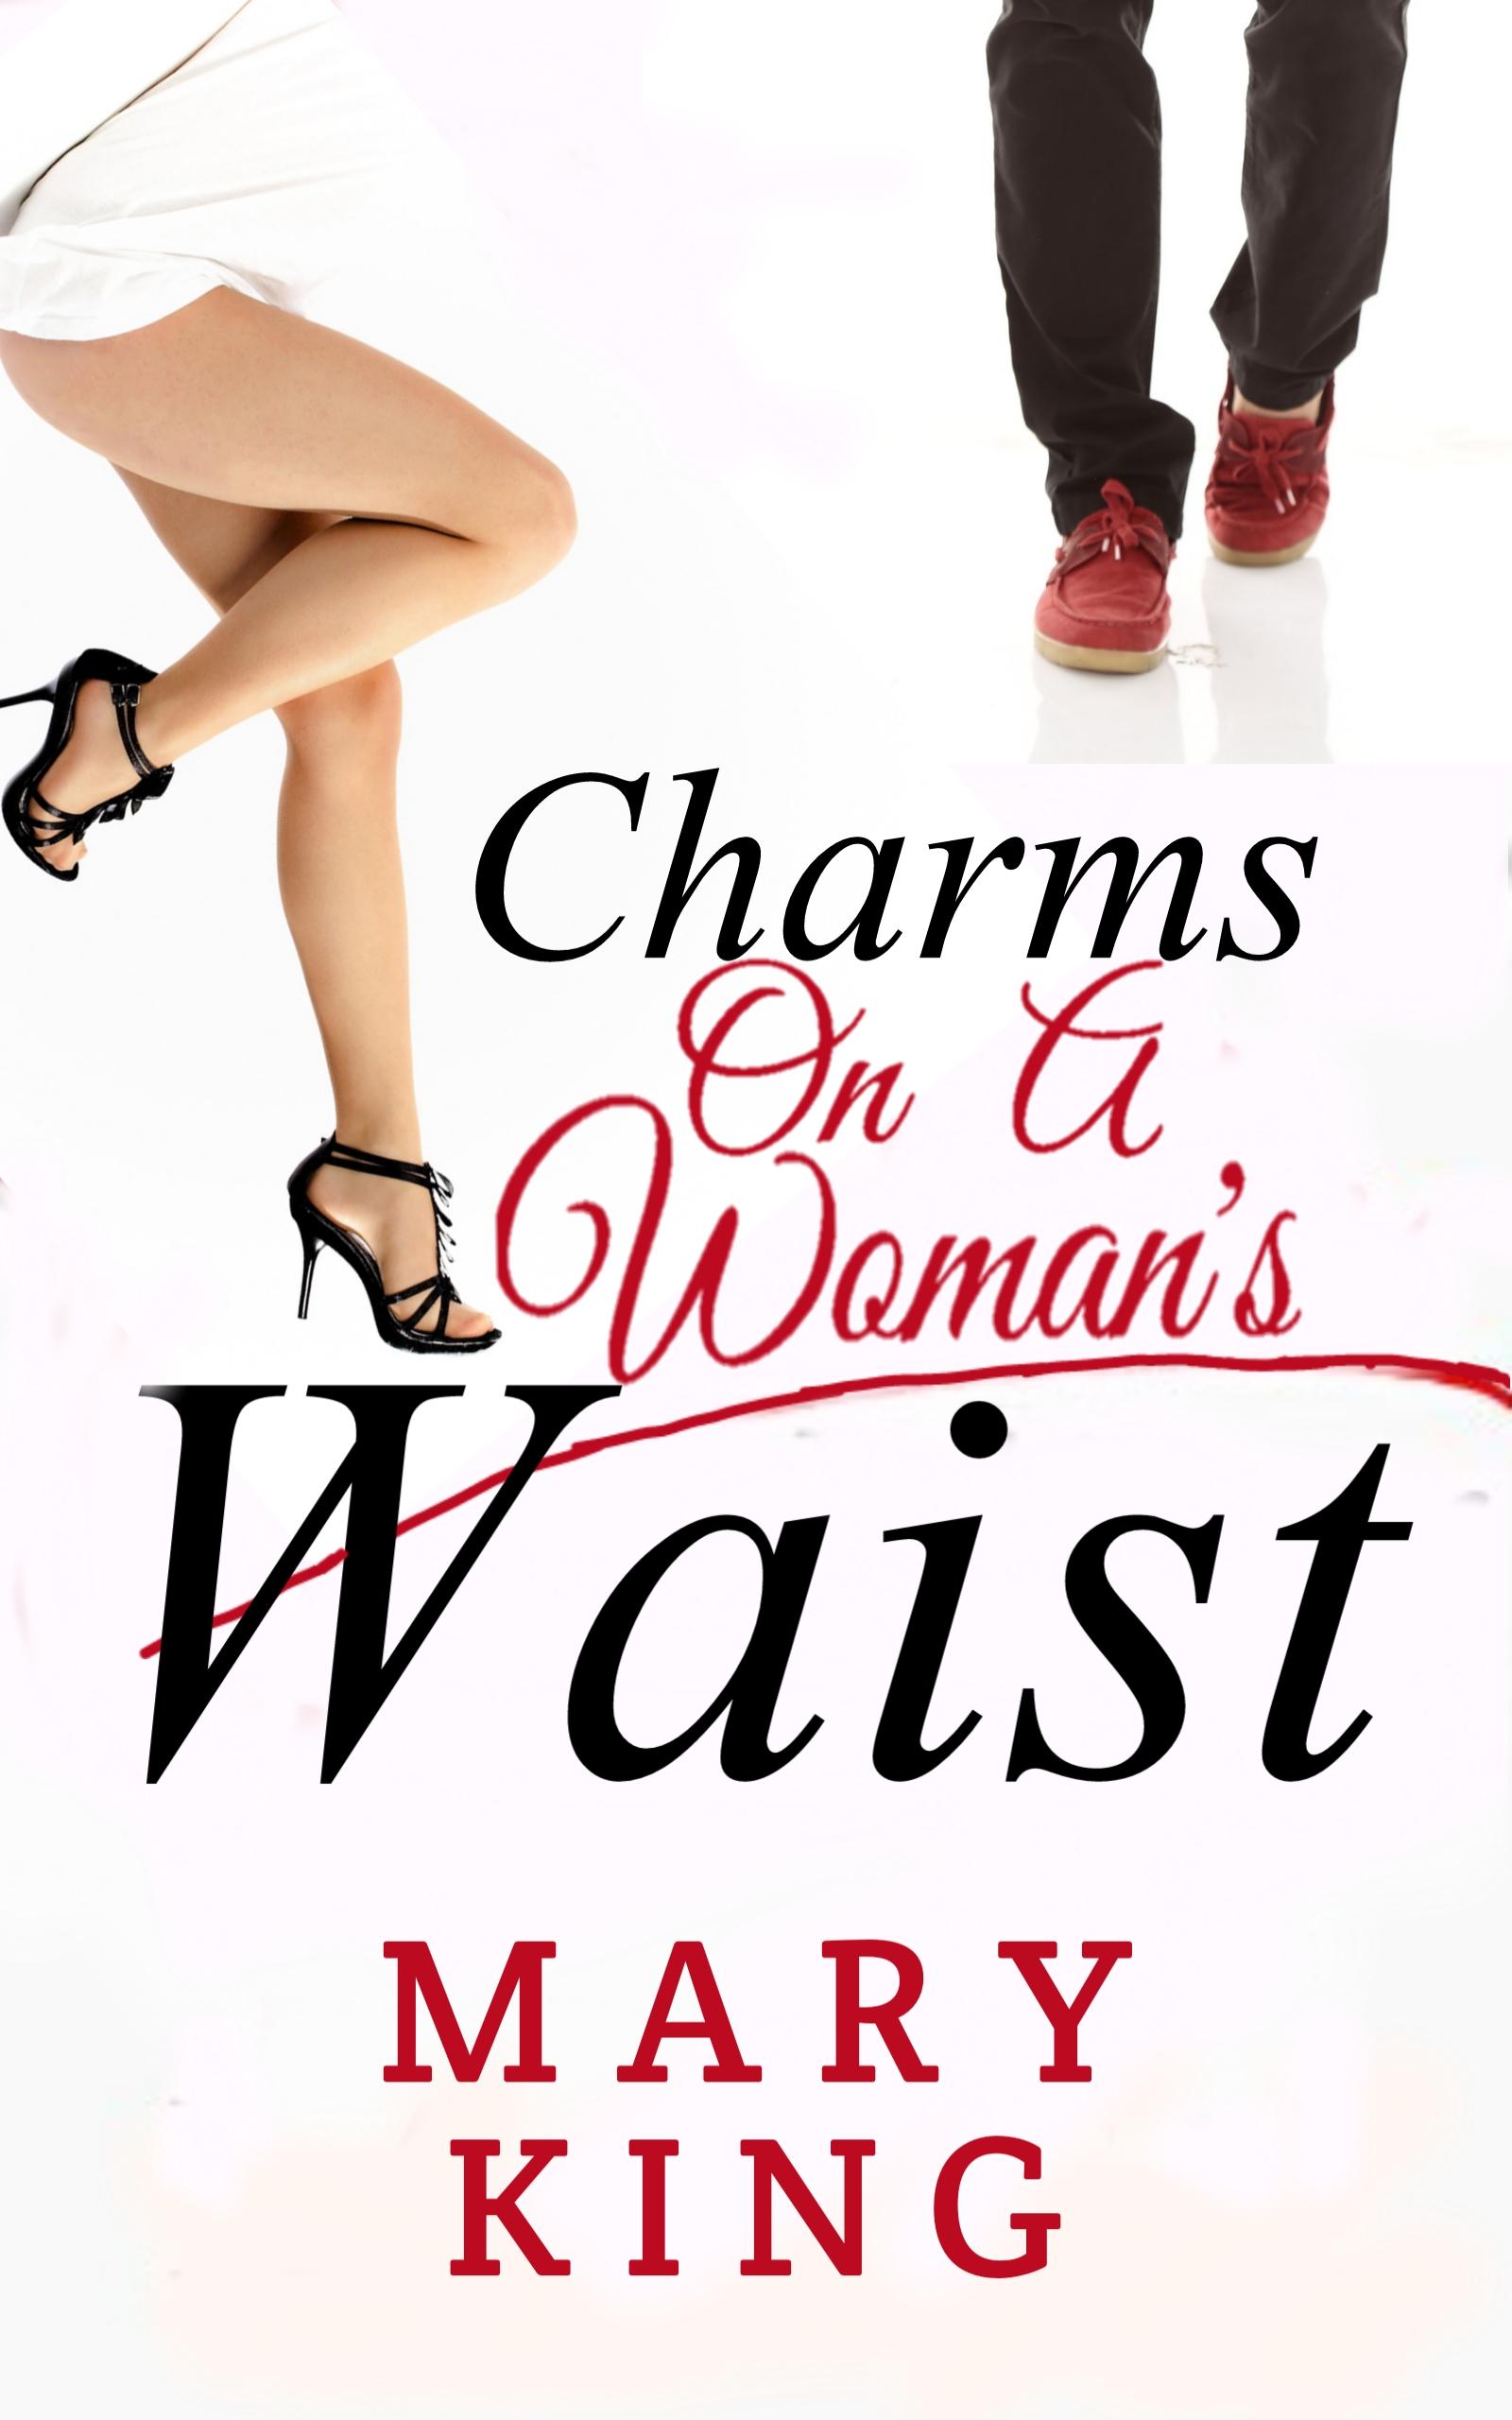 Charms on a woman's waist